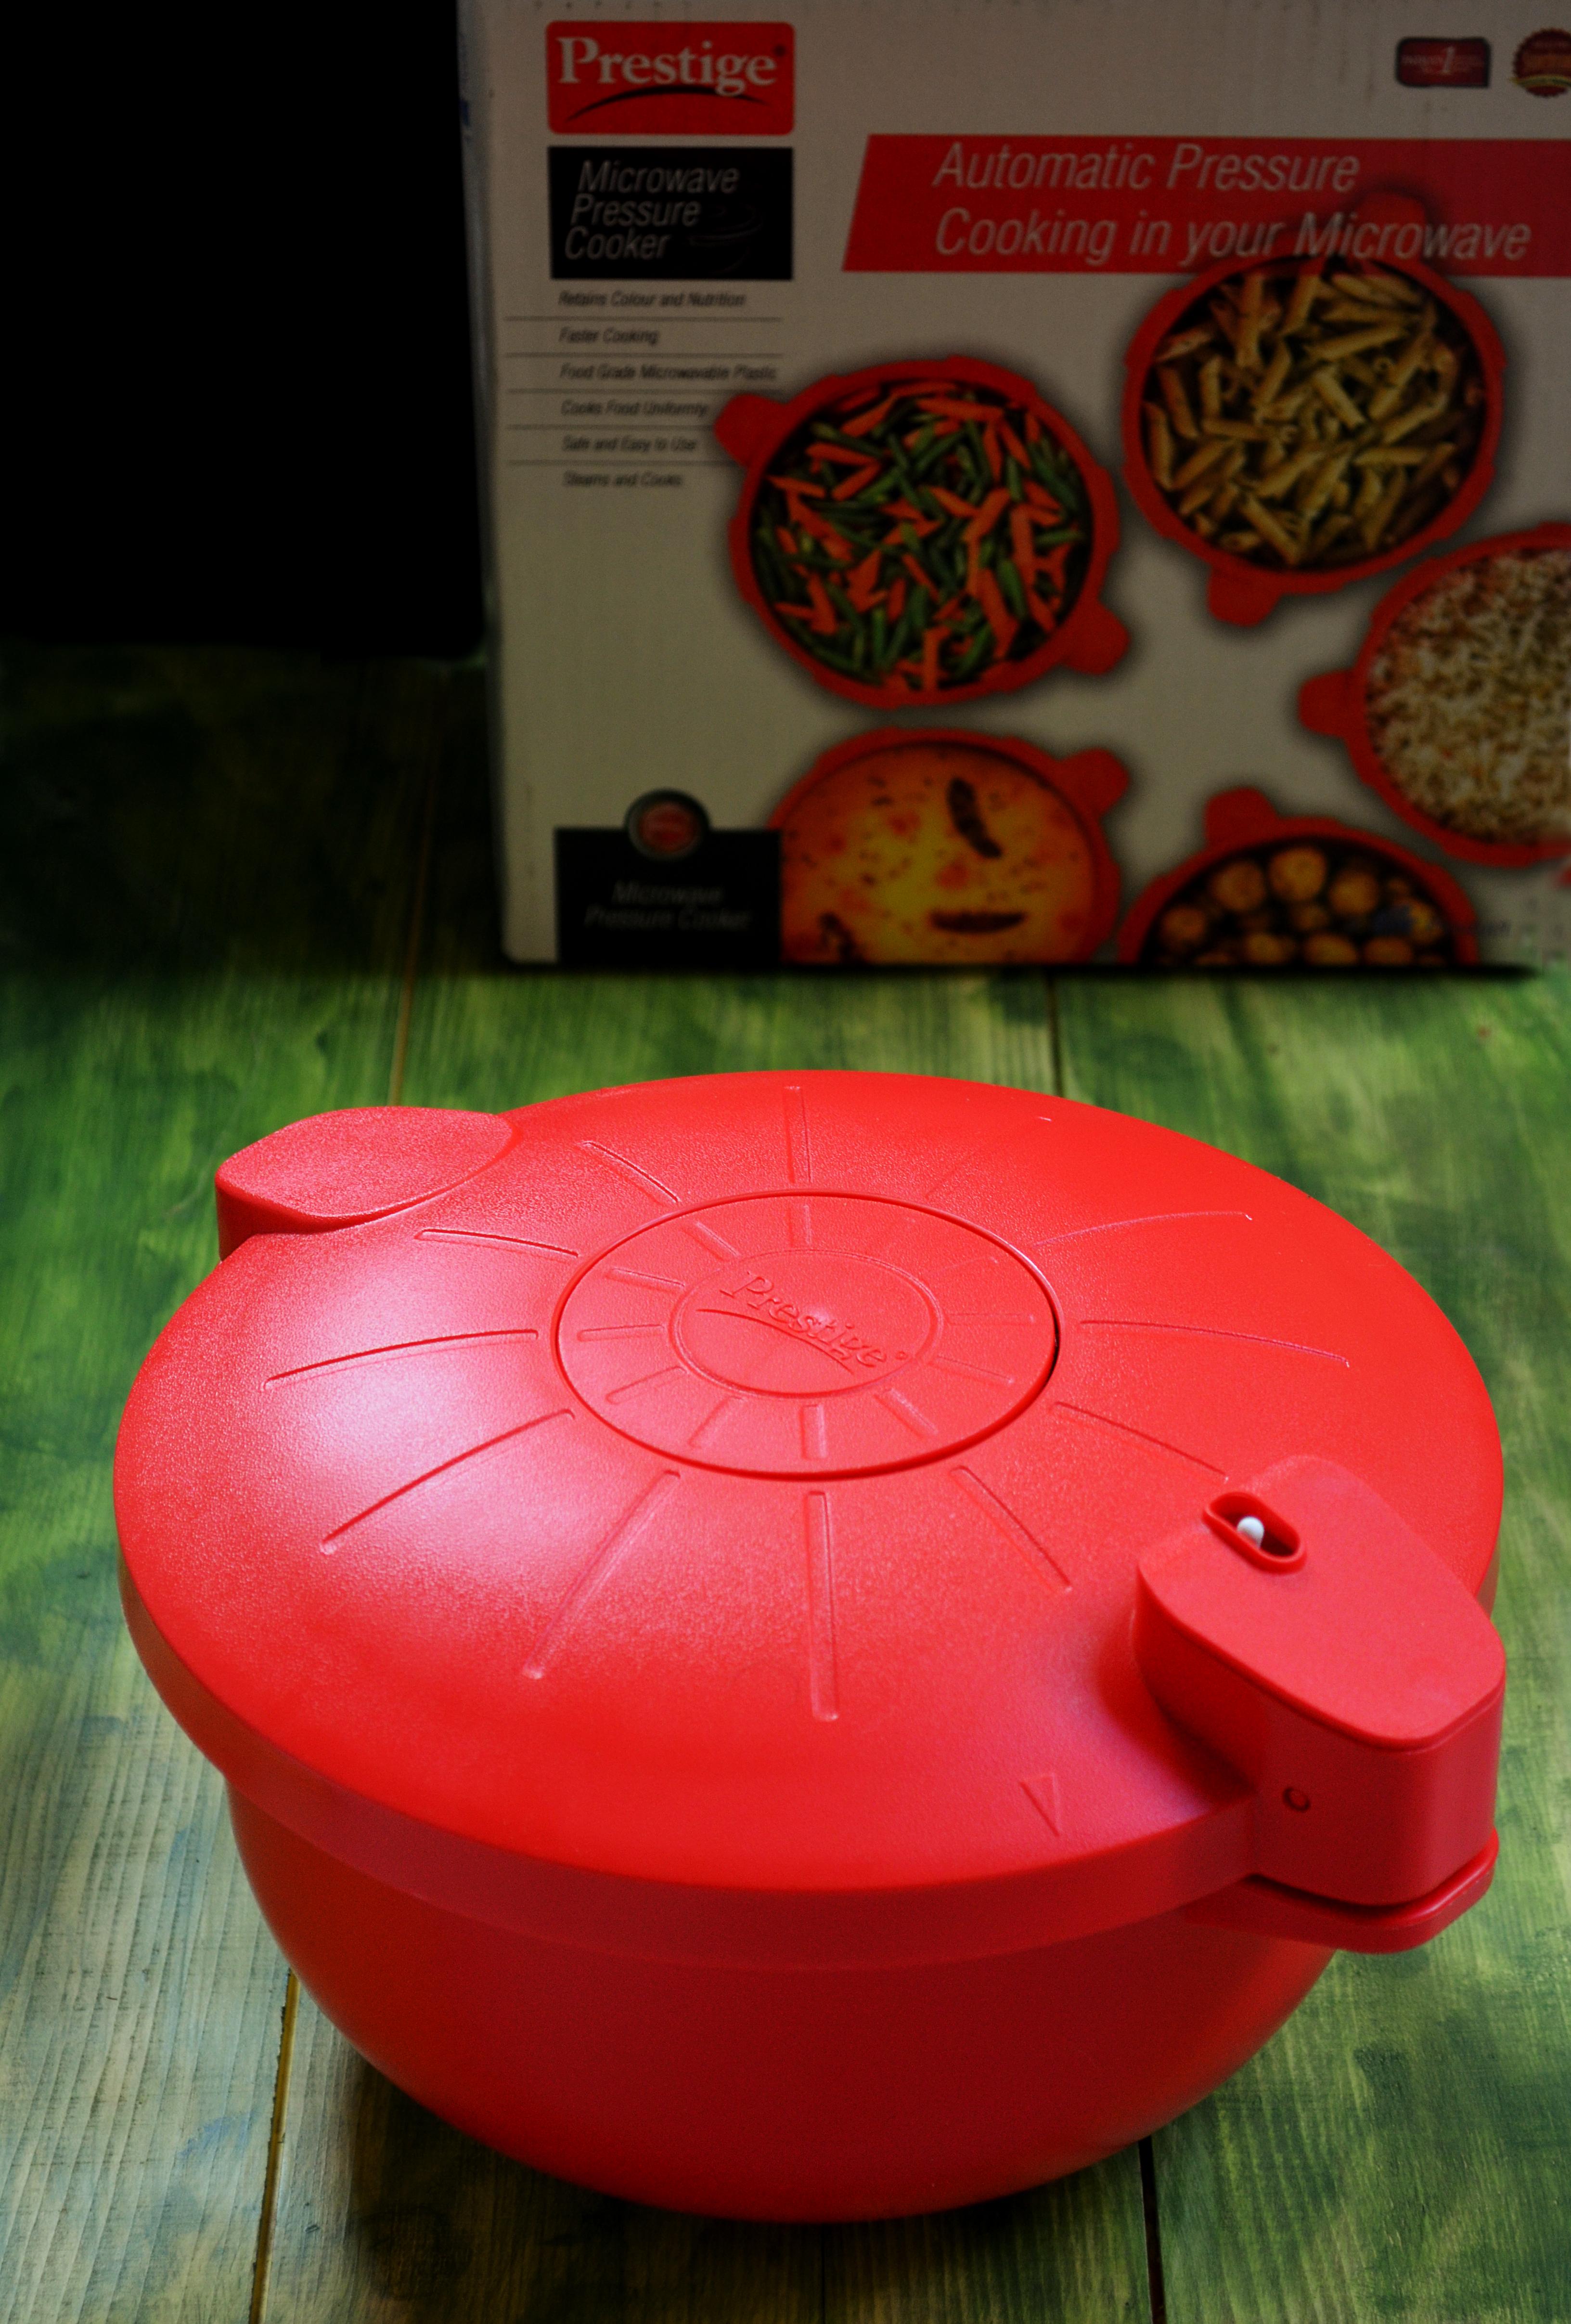 prestige microwave pressure cooker